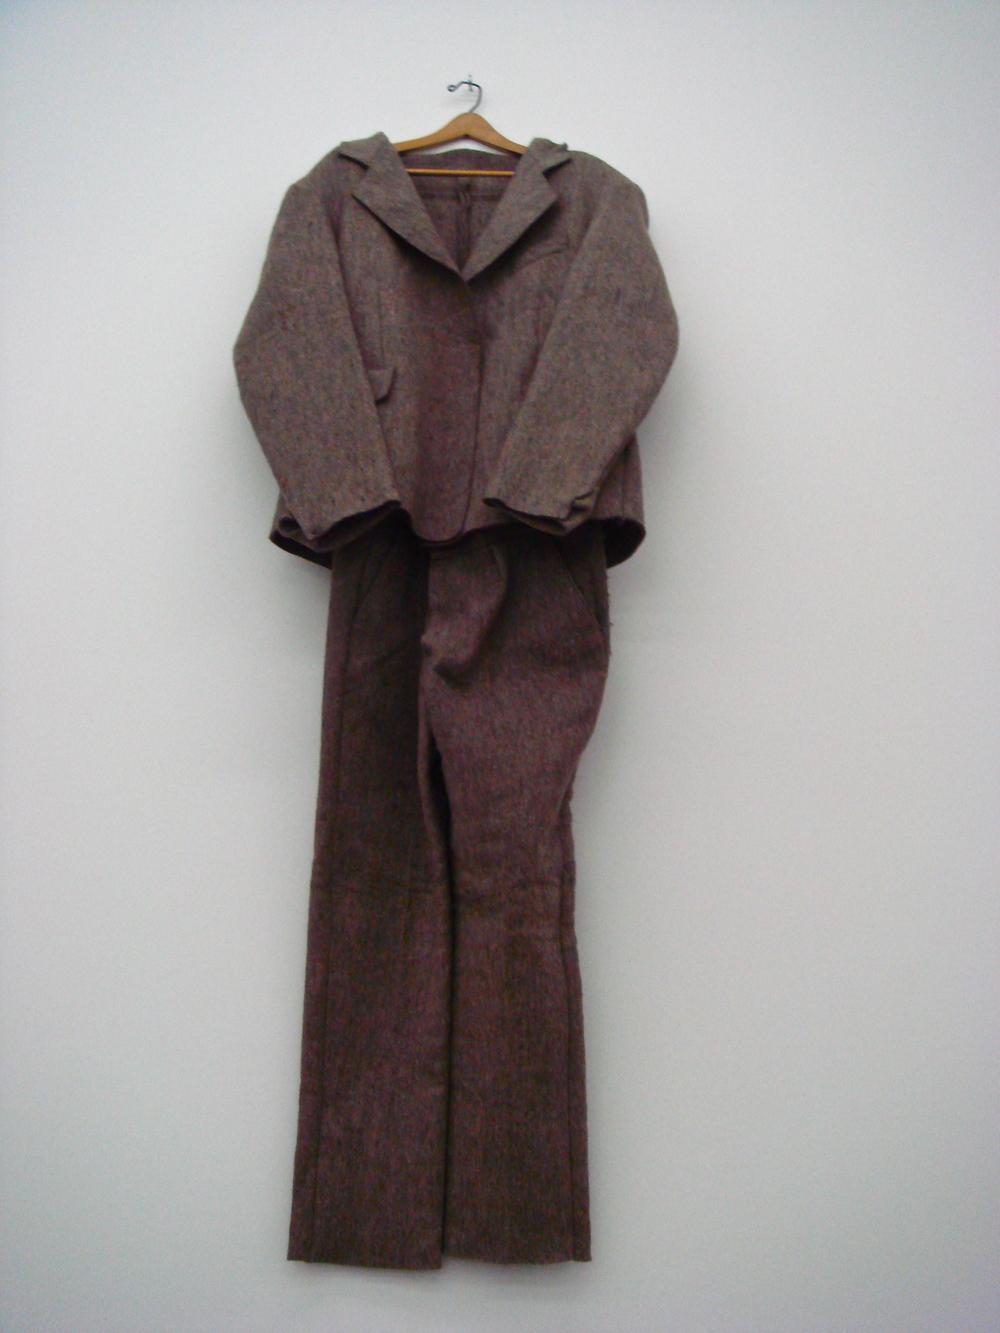 Filzanzug (Felt Suit), 1970               Joseph Beuys